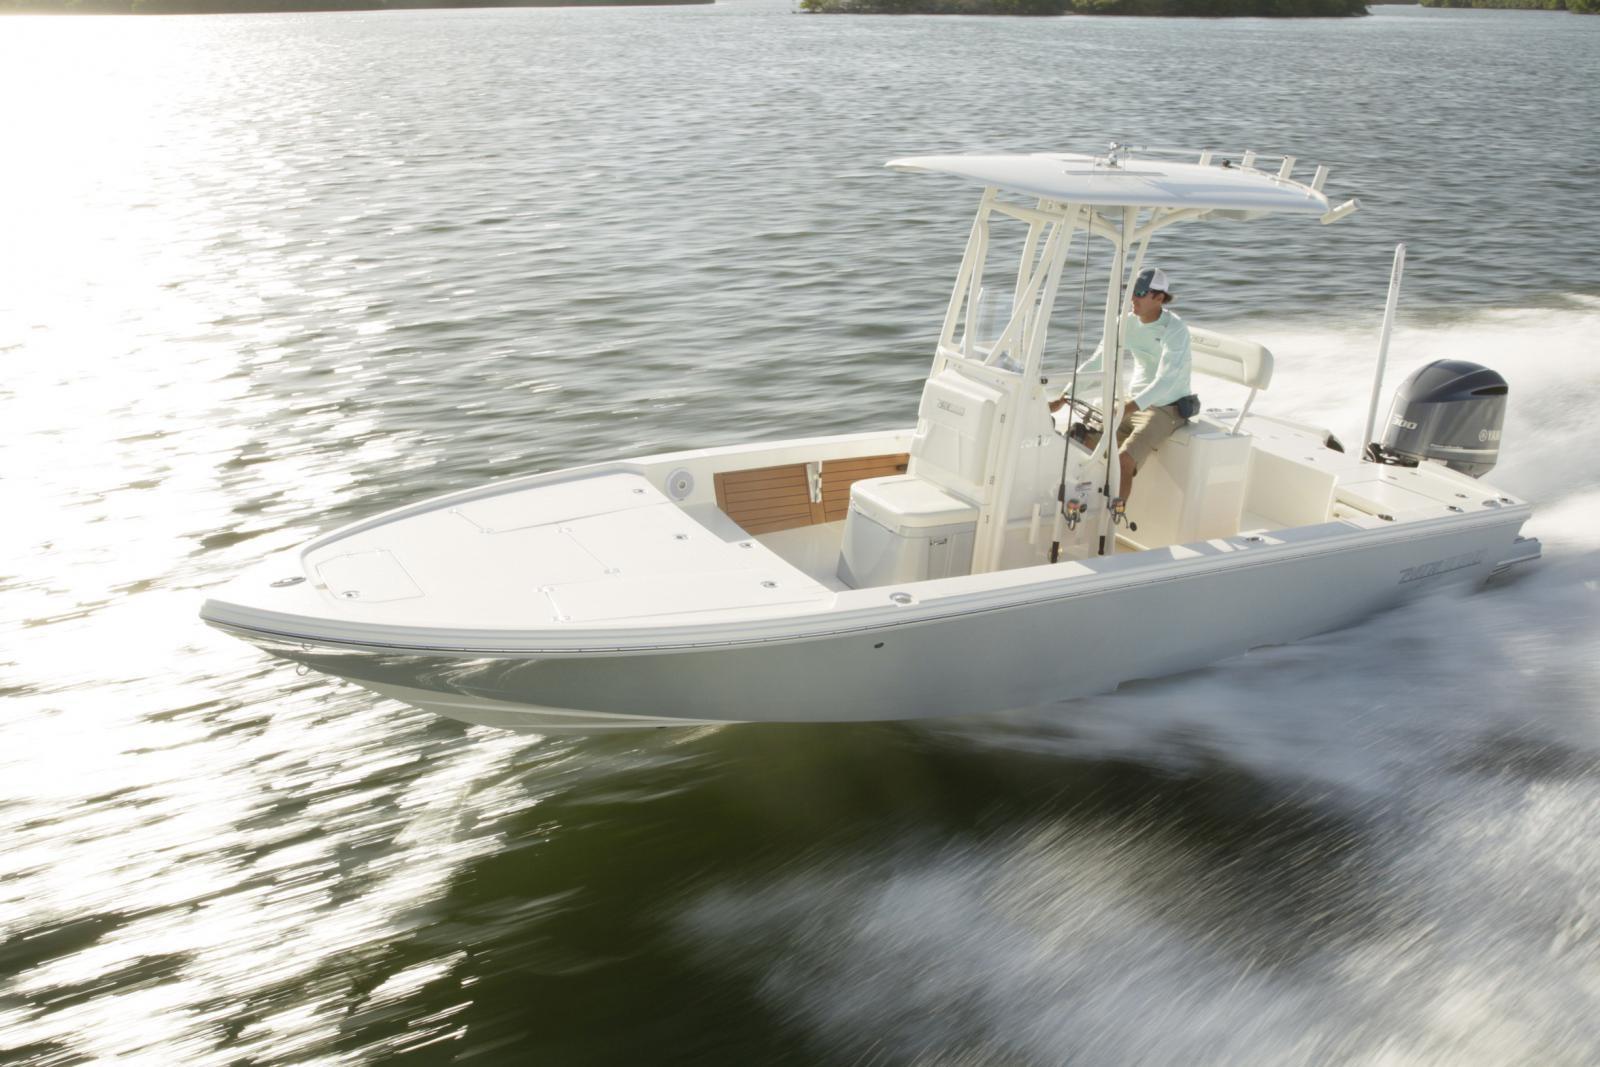 Pathfinder 2500 Hybrid >> 2018 Pathfinder 2500 Hybrid Power Boat For Sale - www.yachtworld.com